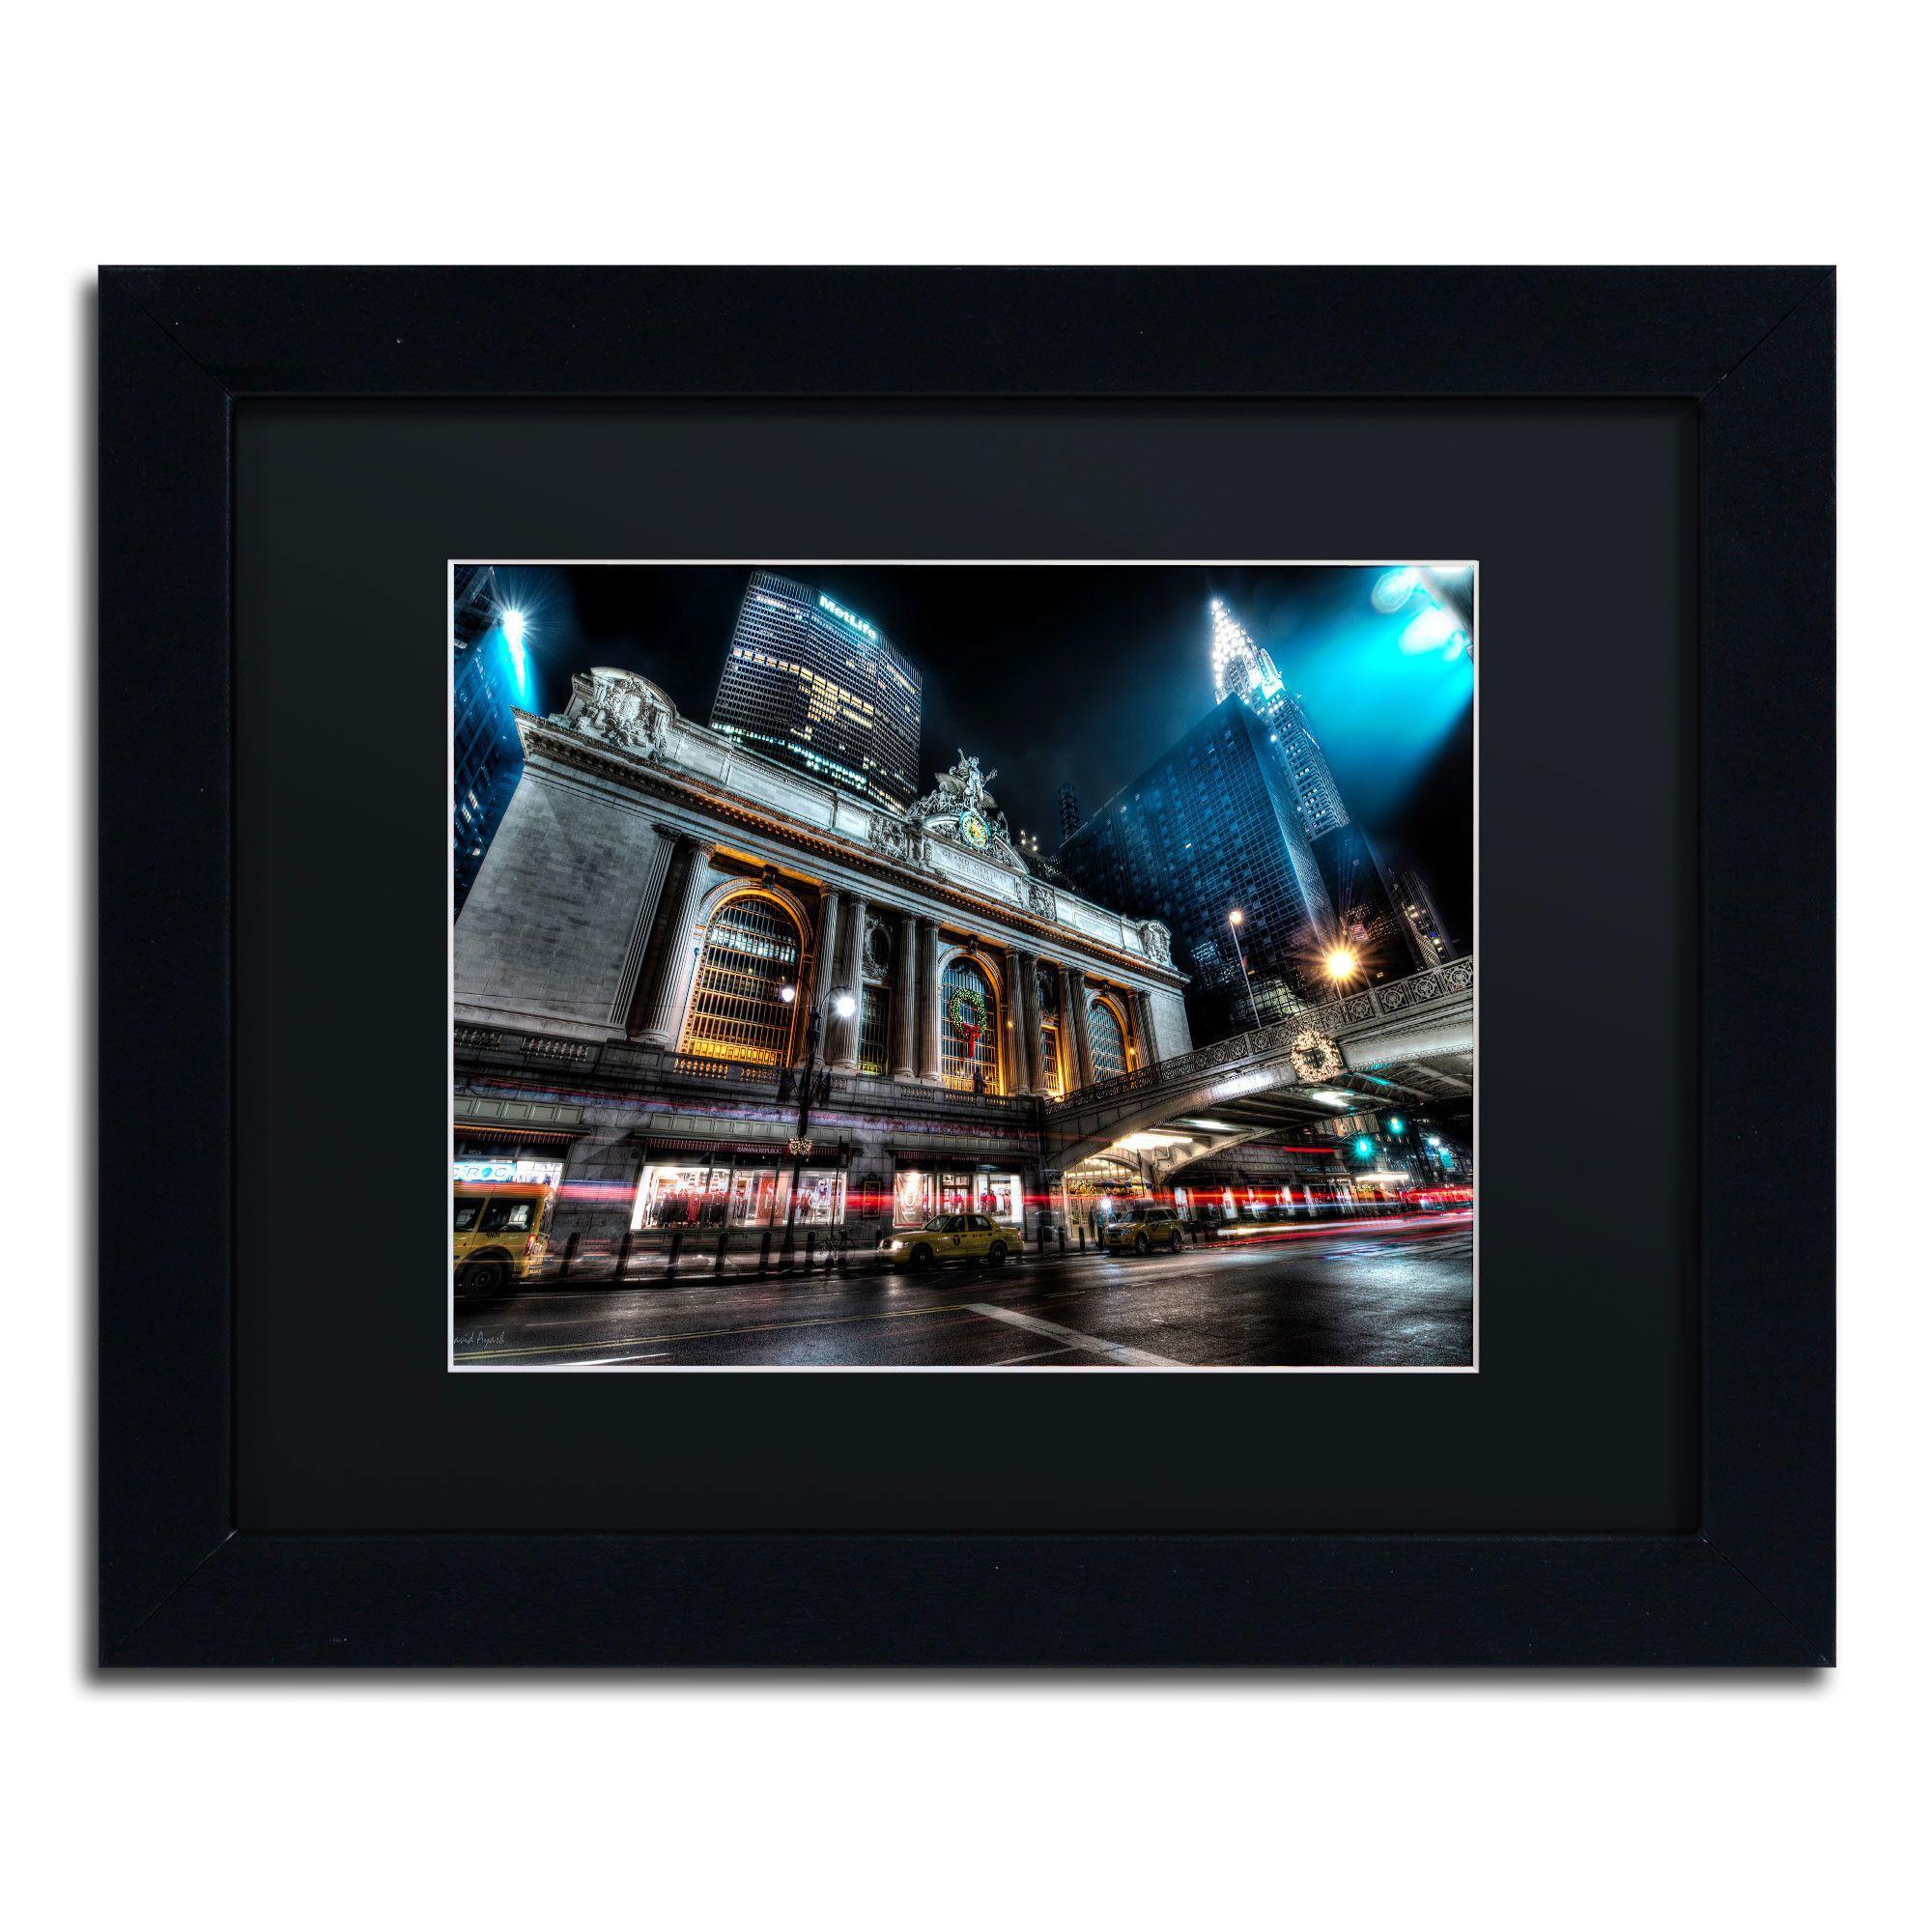 'Grand Central Terminal 42nd. Street - Manhattan' by David Ayash Framed Photographic Print